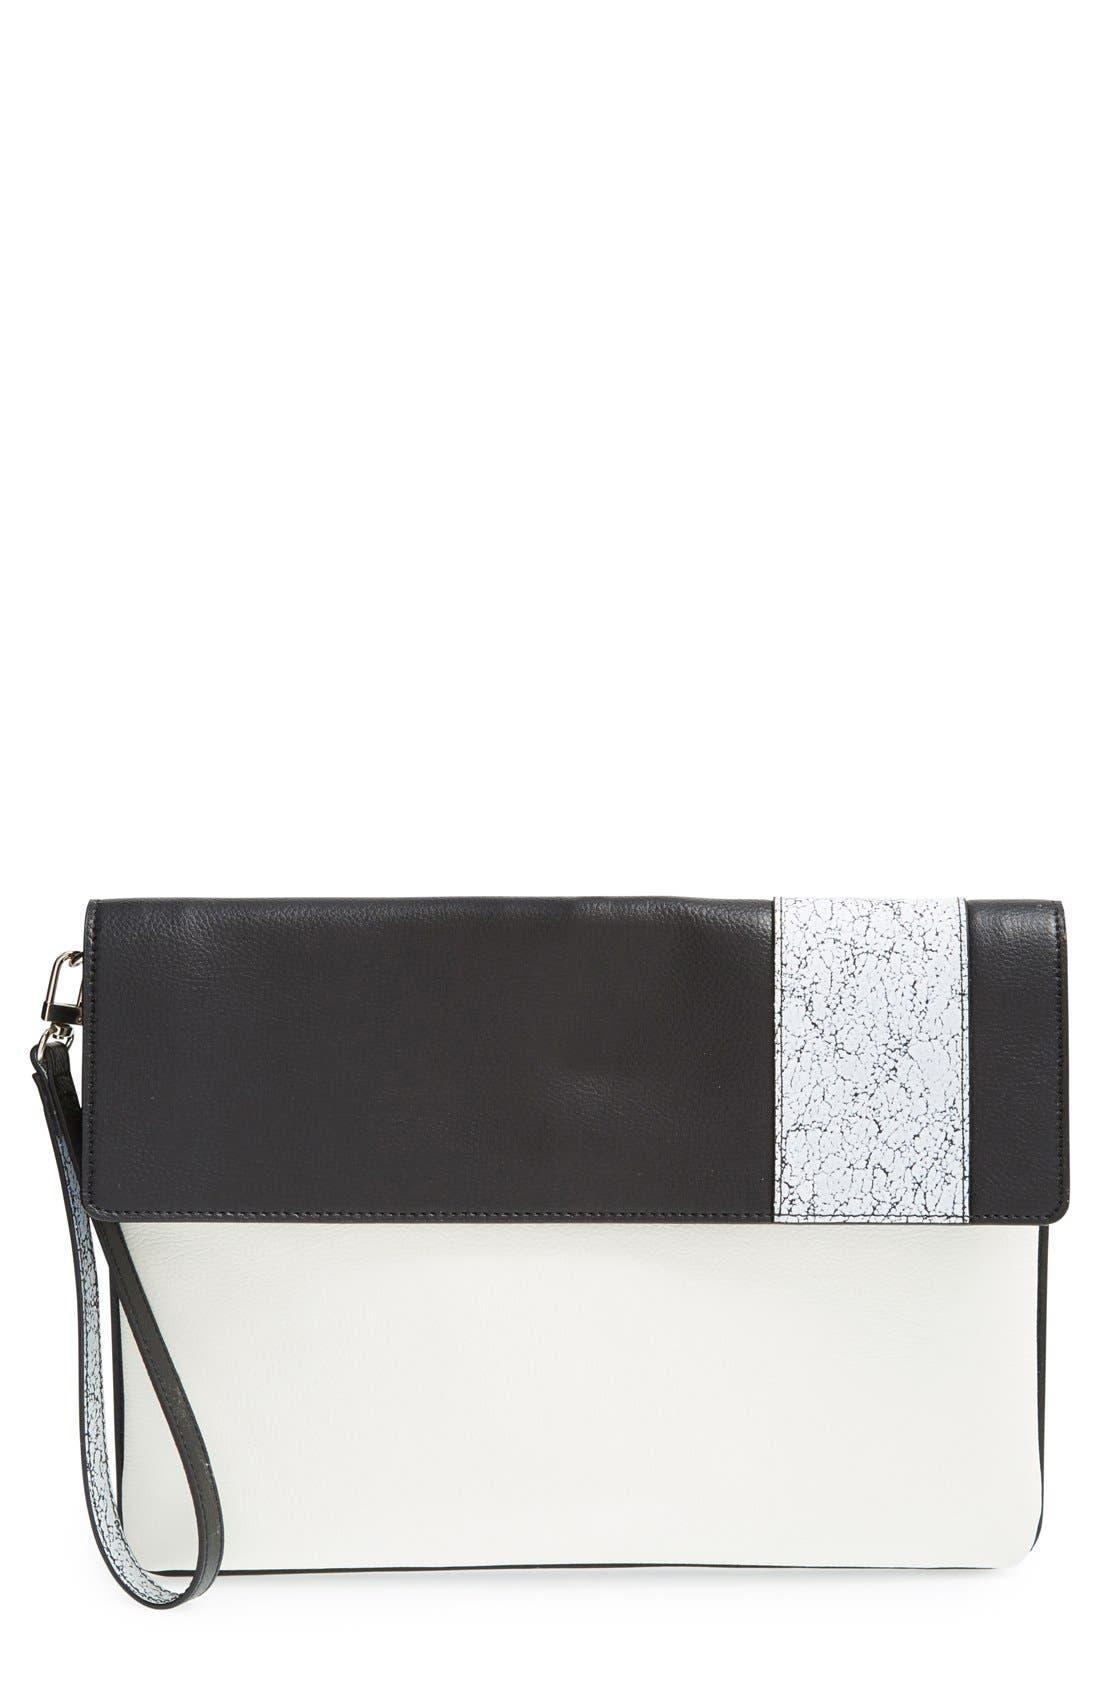 Main Image - Halogen® 'Racer Stripe' Python Embossed Leather Clutch